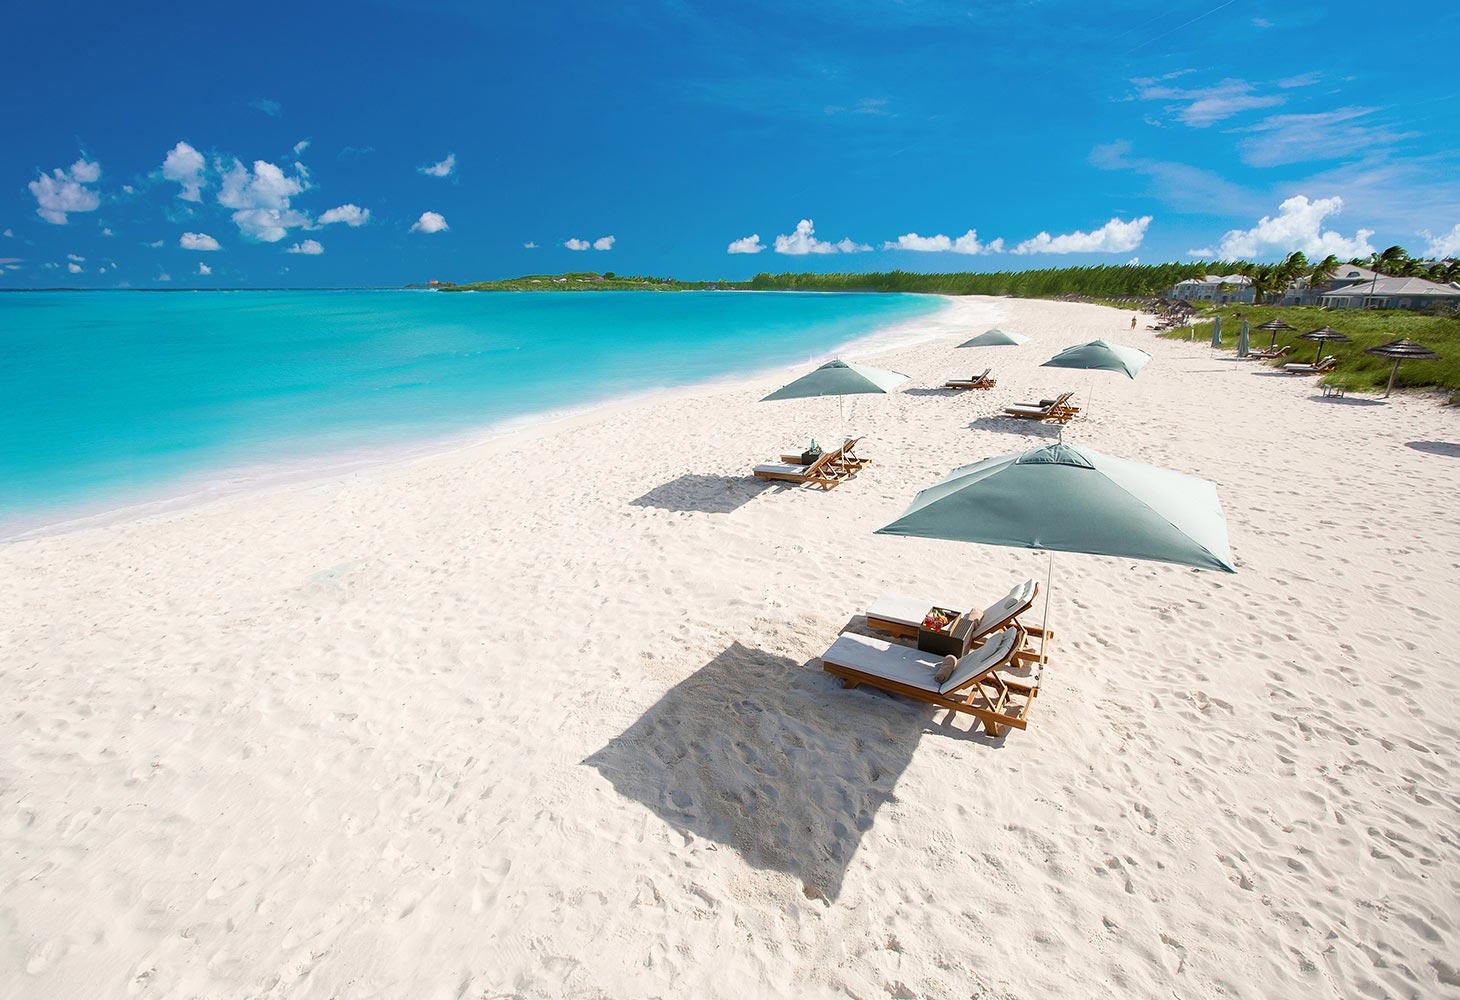 sandals beach resort in Exuma